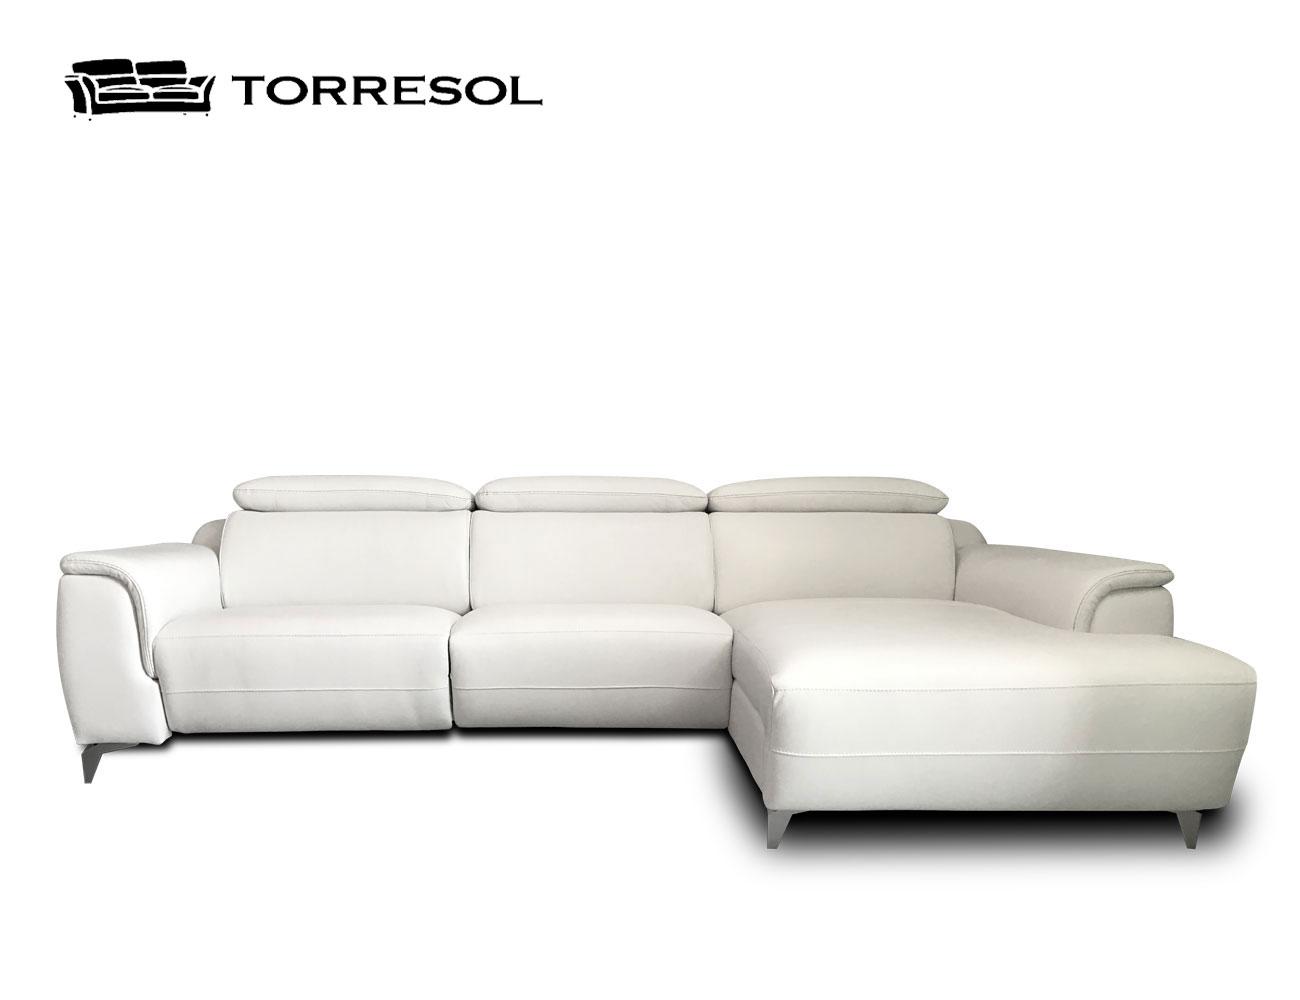 Sofa mosset torresol1